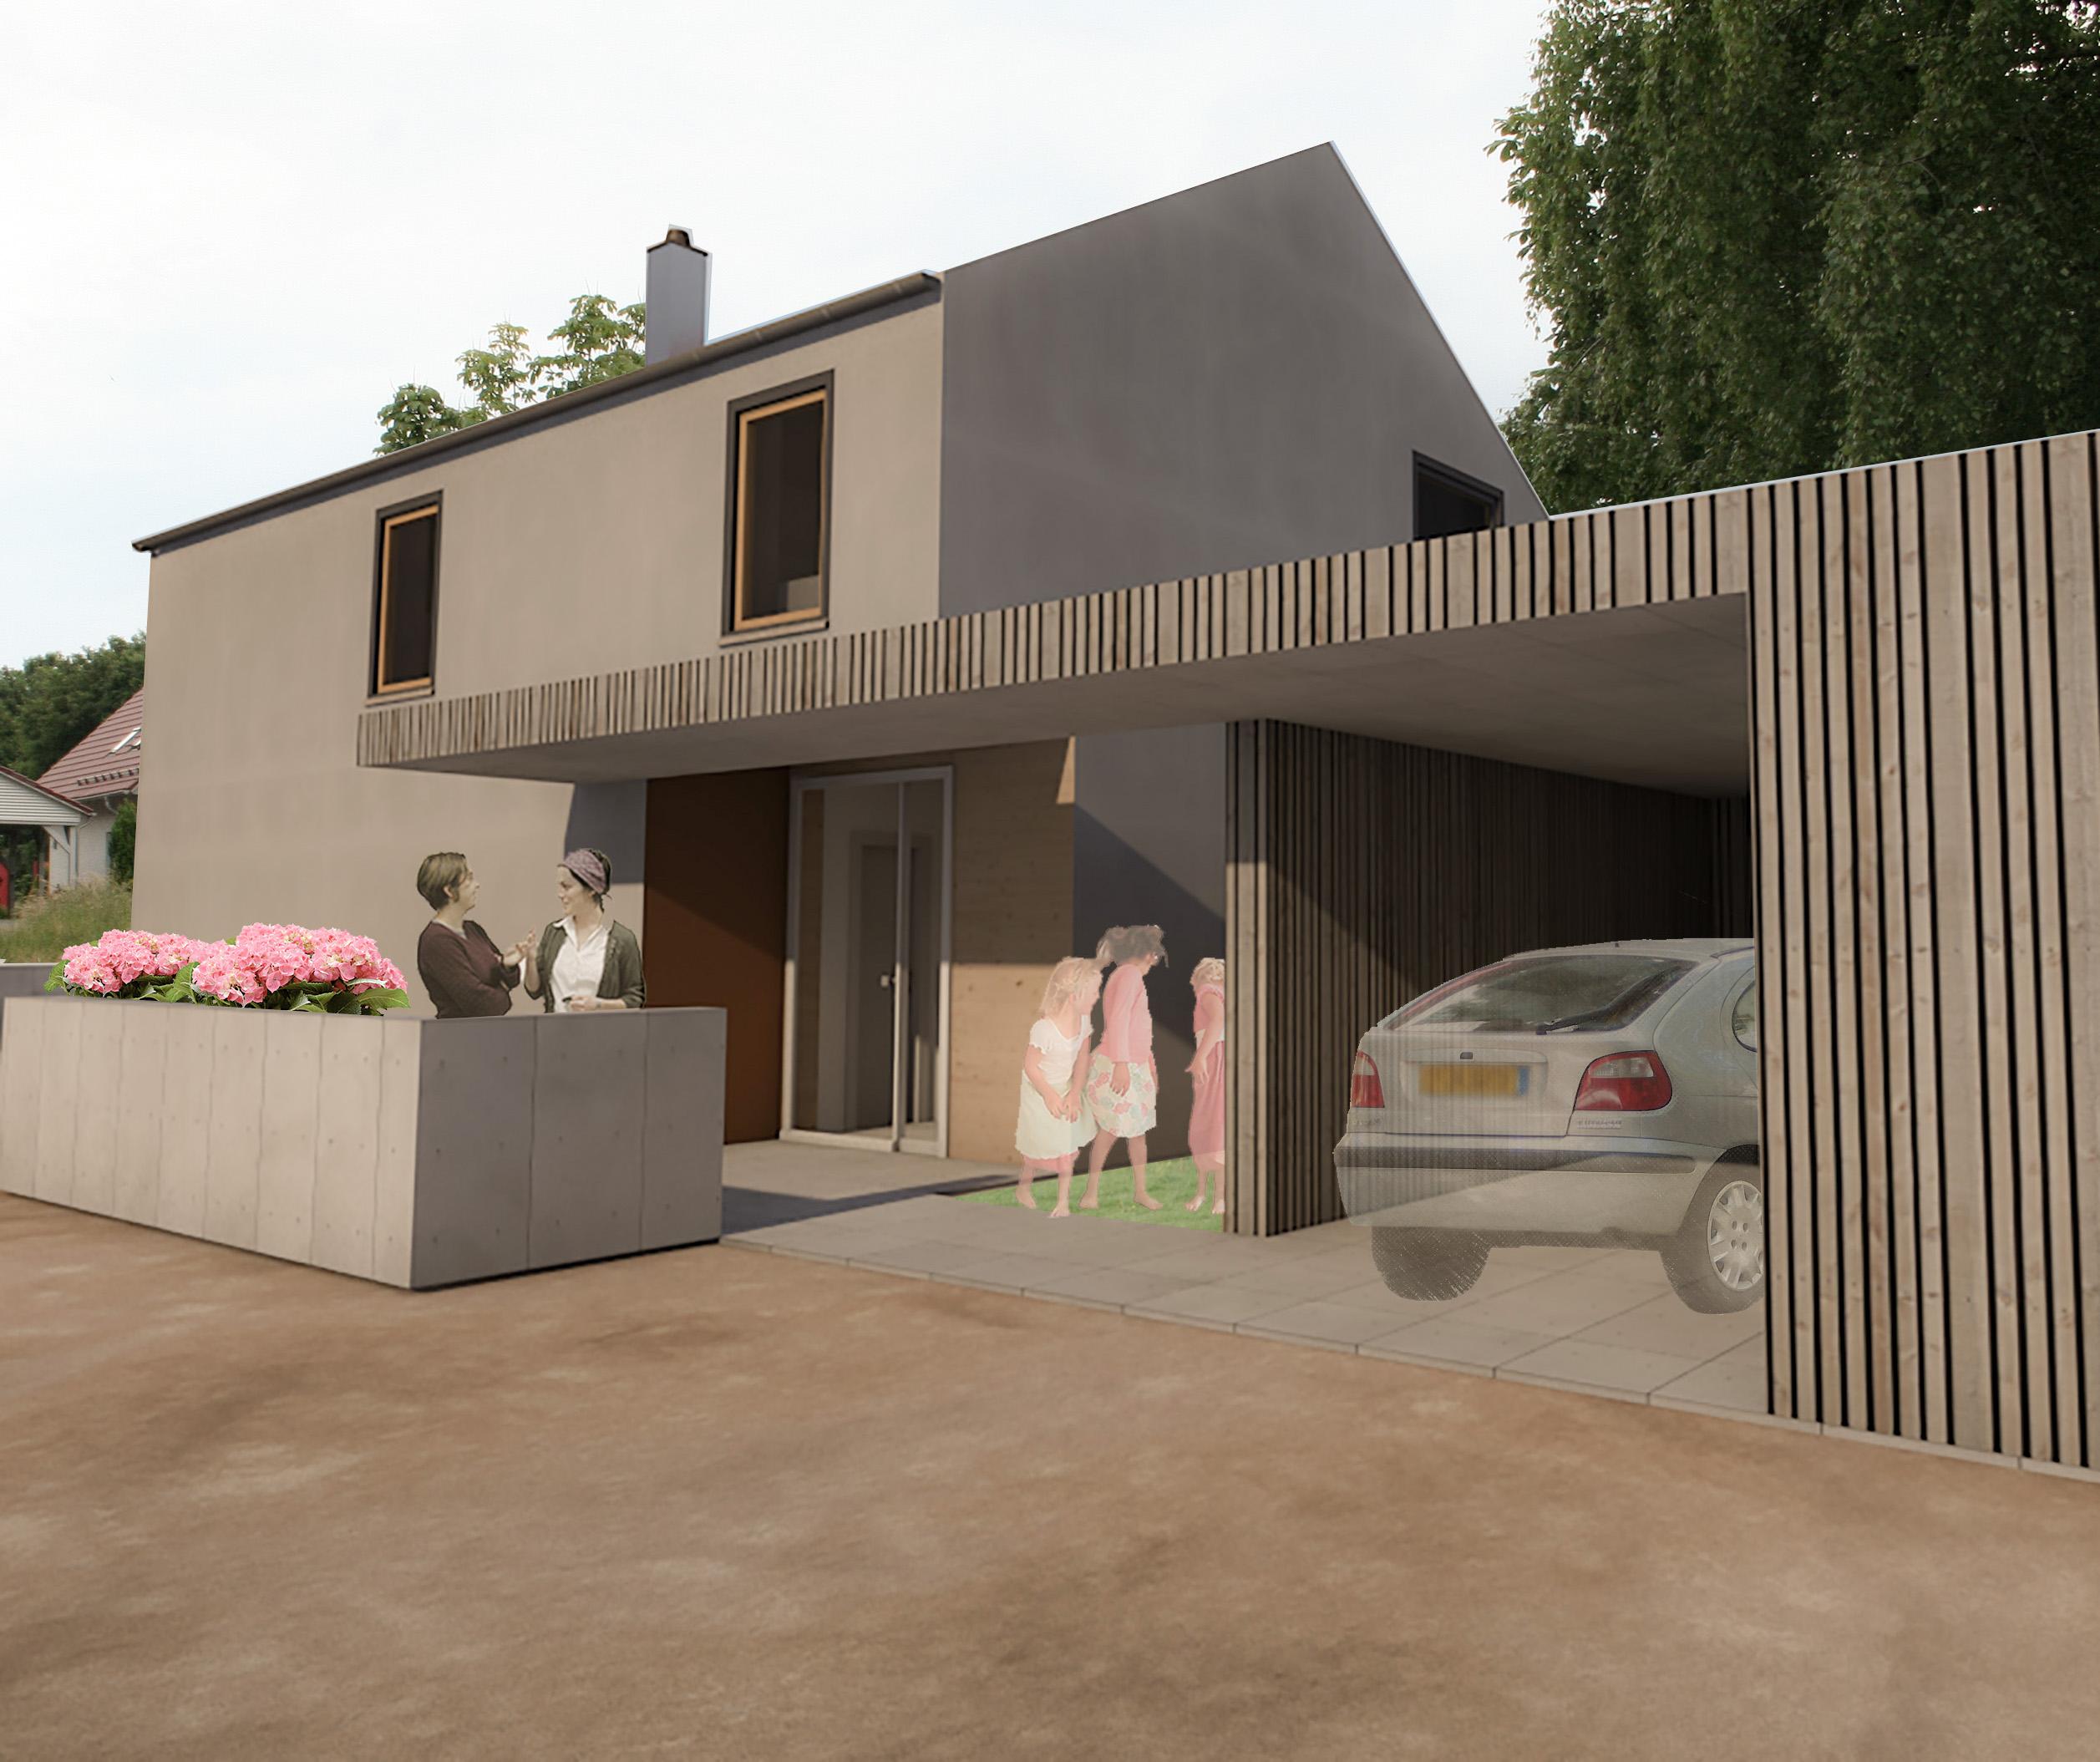 Drei Modell-Einfamilienhäuser